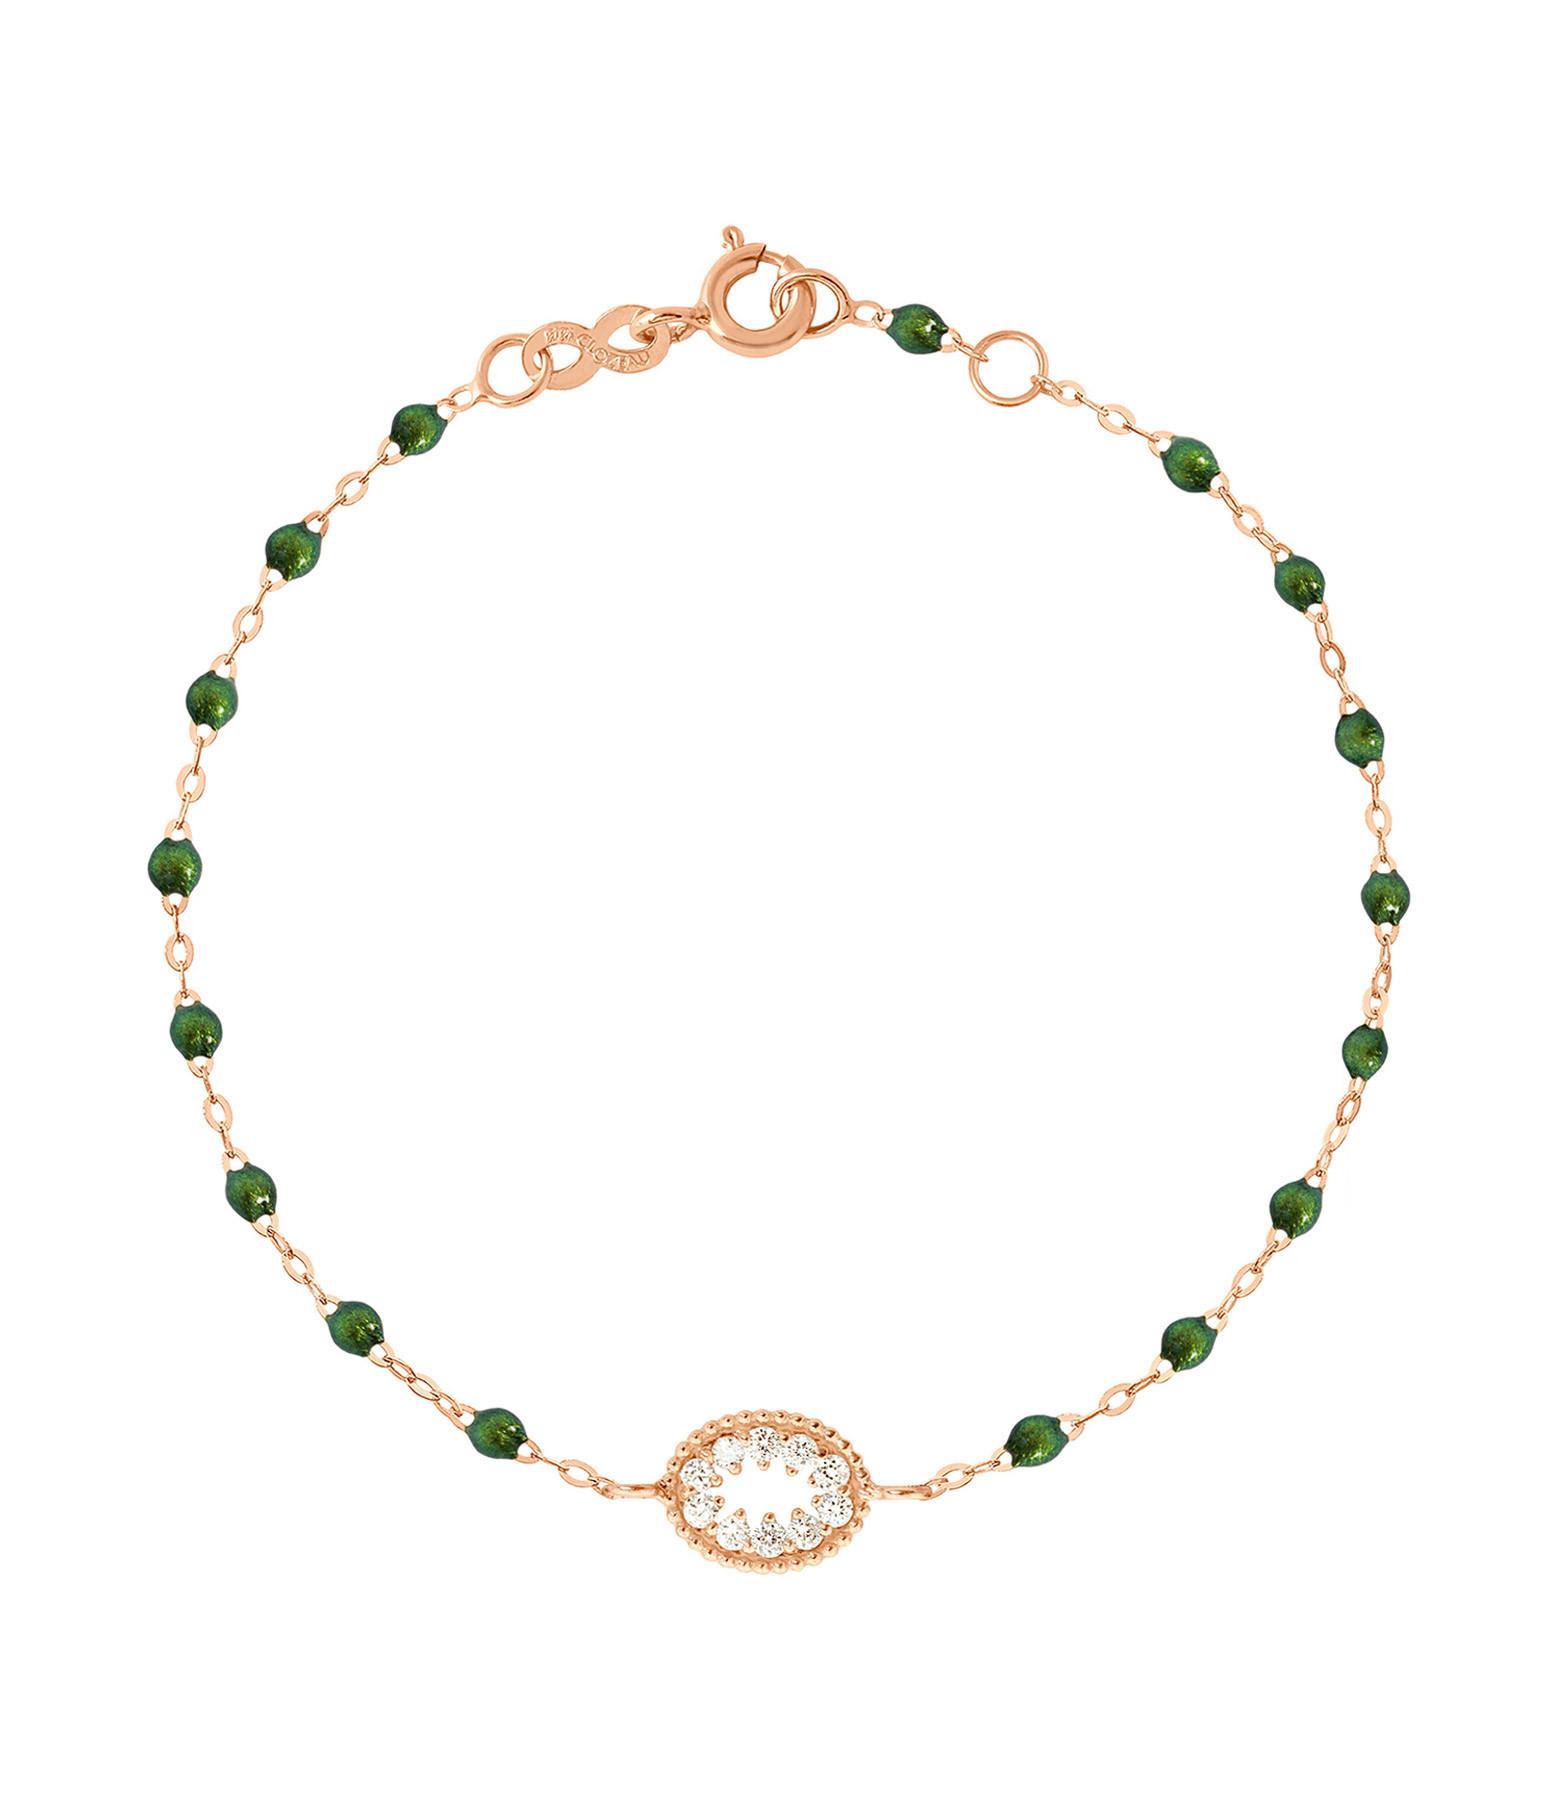 GIGI CLOZEAU - Bracelet Résine L'Œil du Pirate Diams Or rose